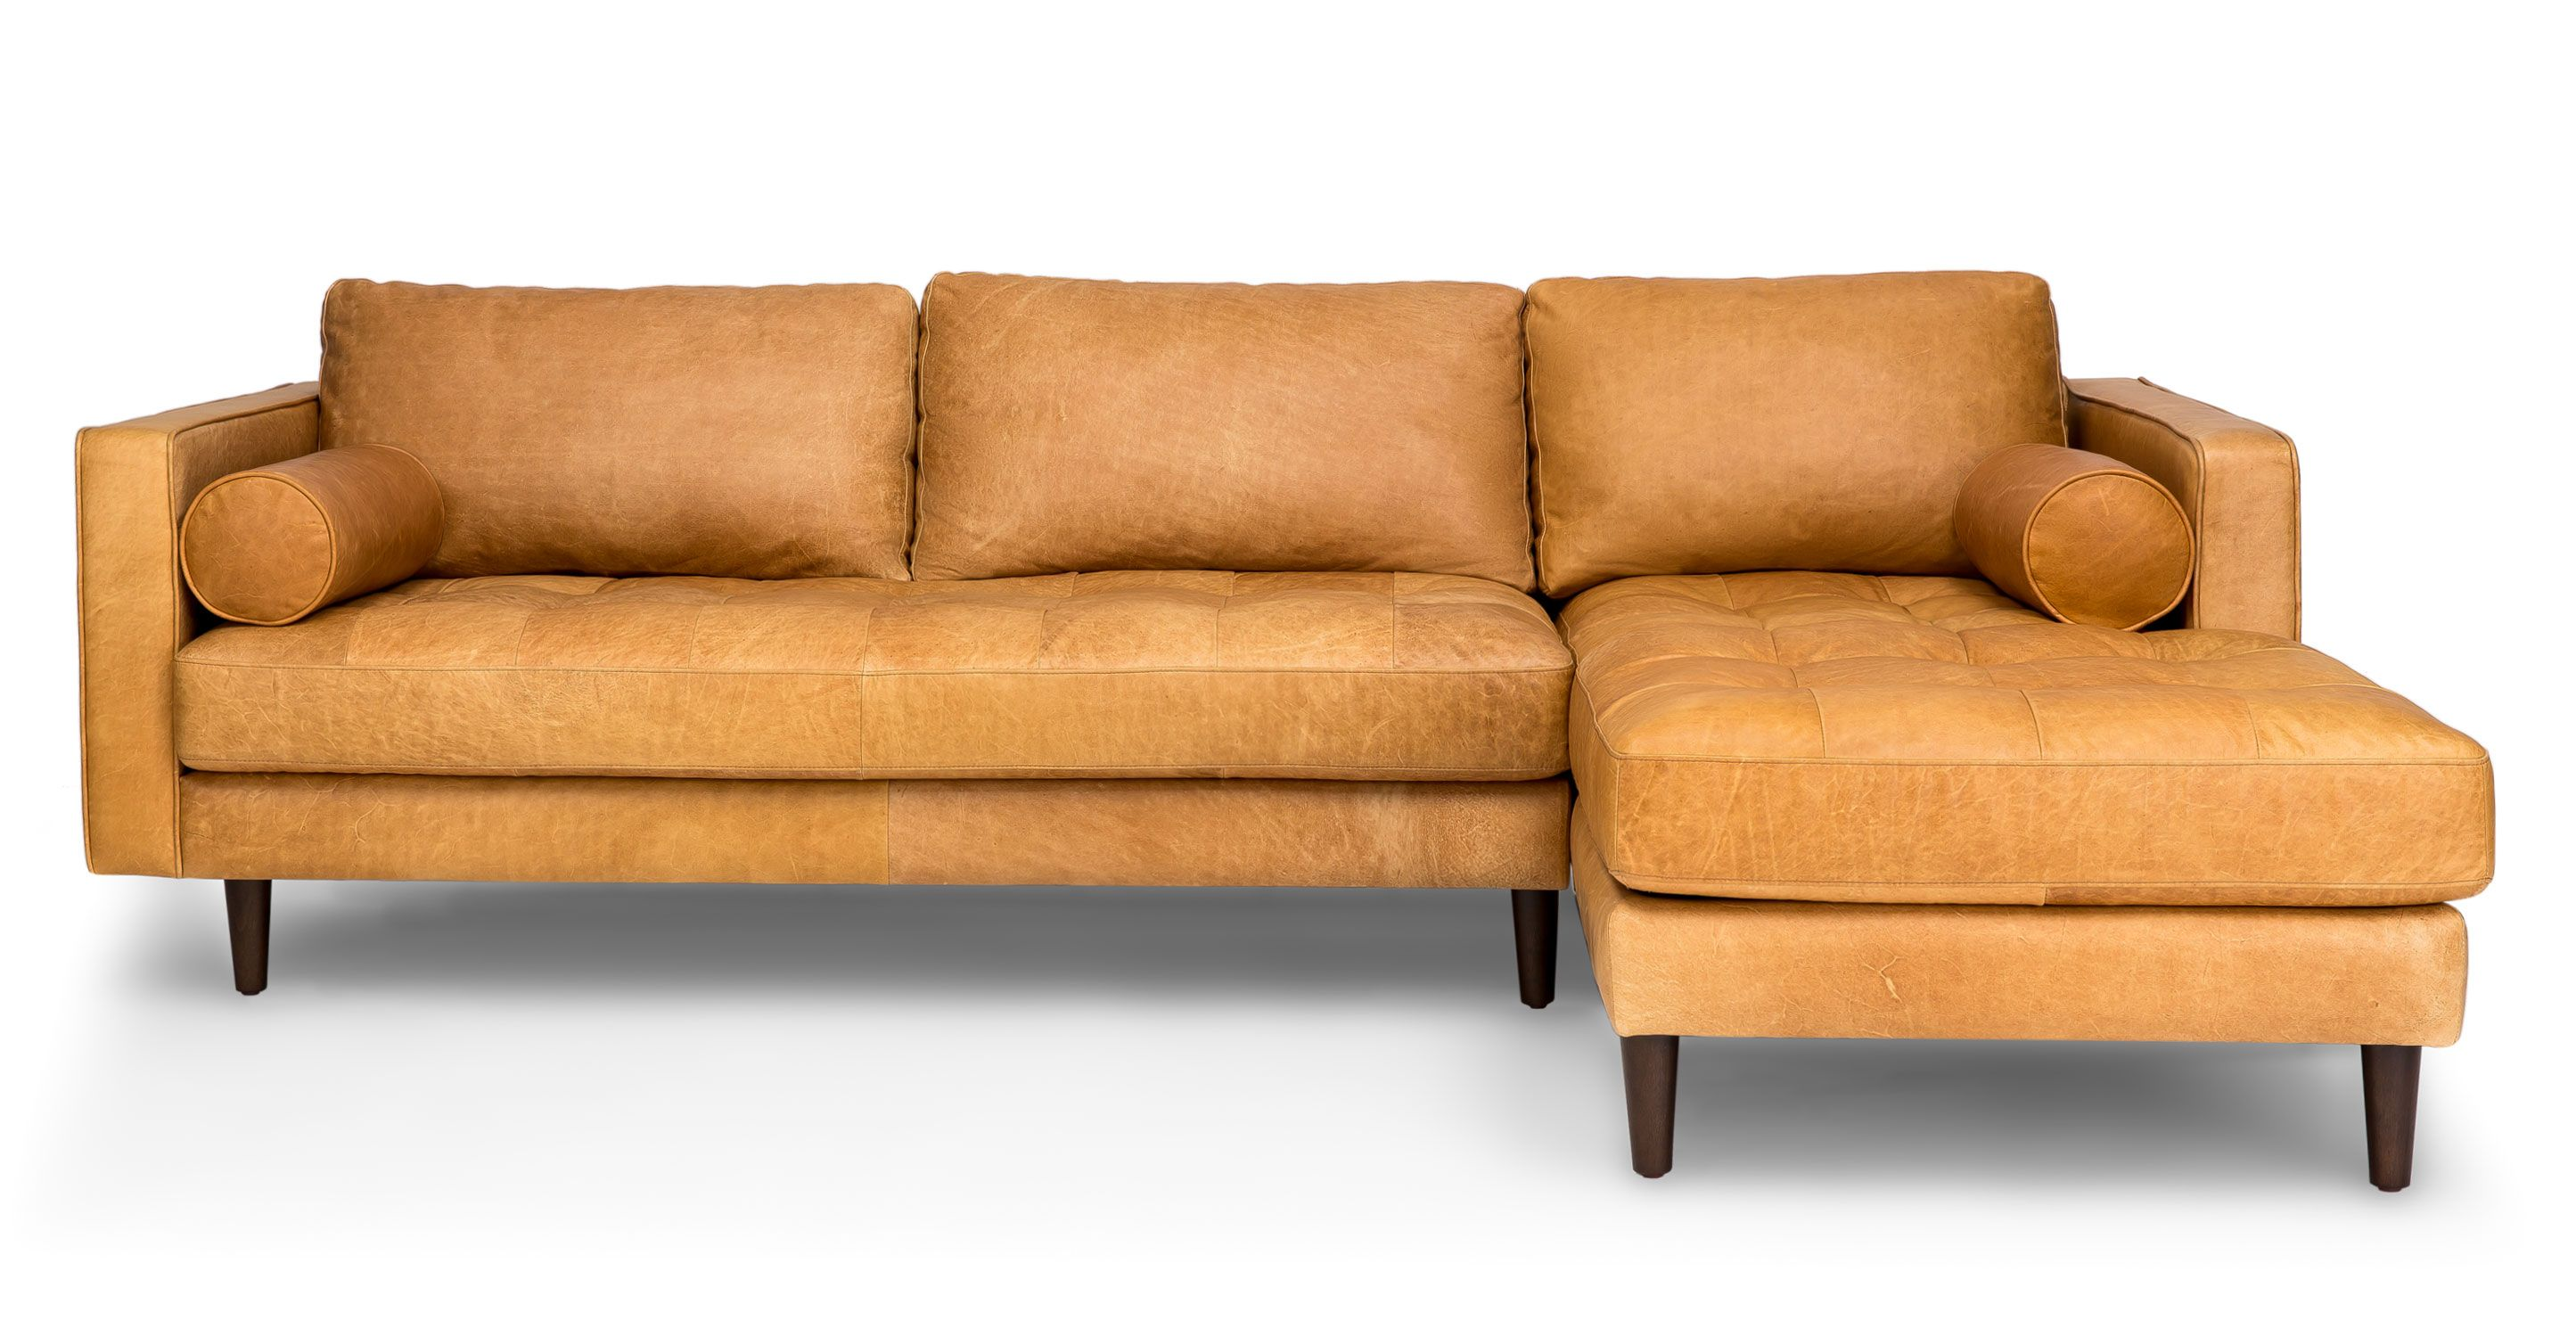 century furniture sofa quality restoration hardware maxwell replica sven charme tan right sectional scandinavian